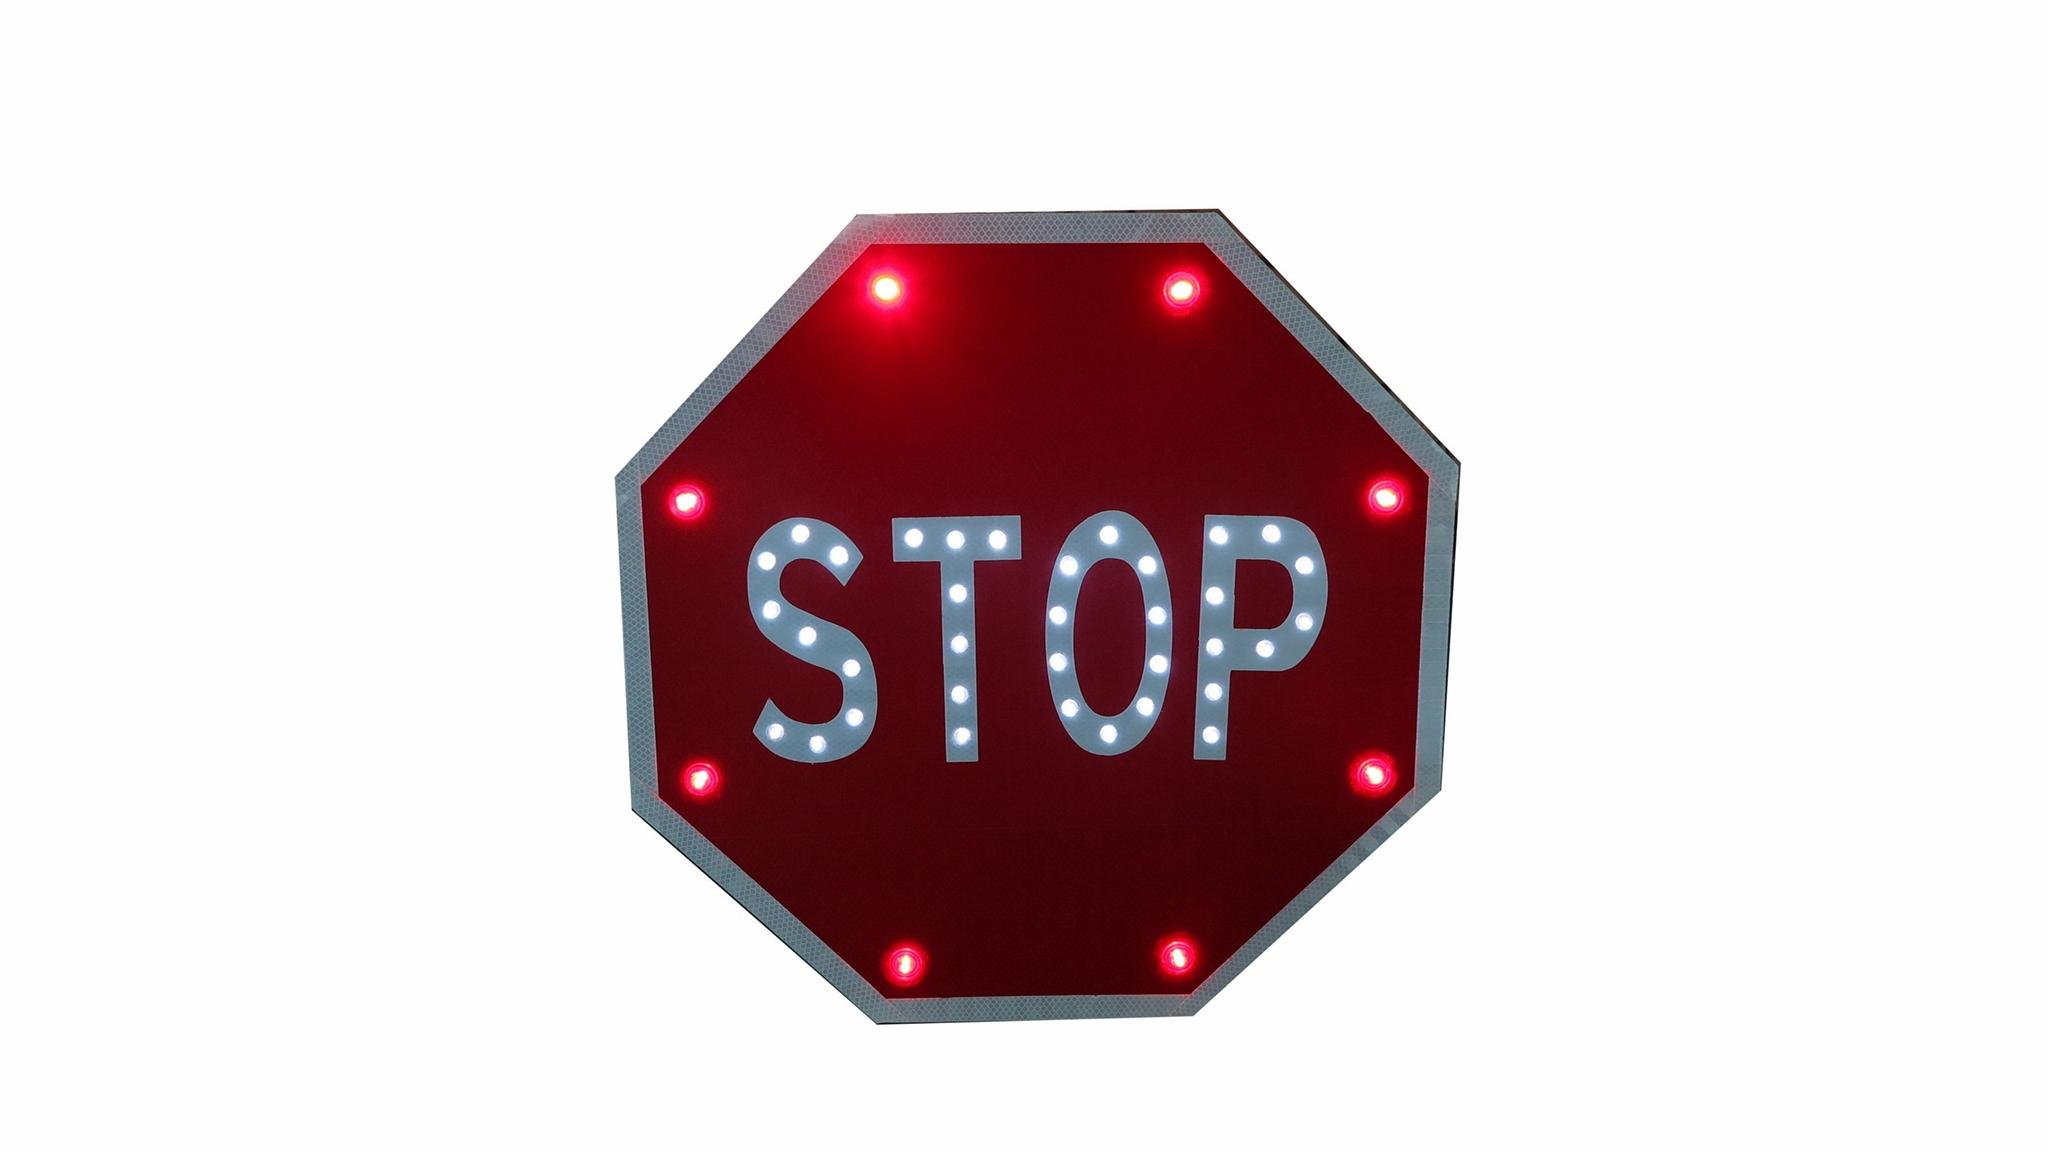 Solar traffic sign schoolbus stop sign road safety marker 4